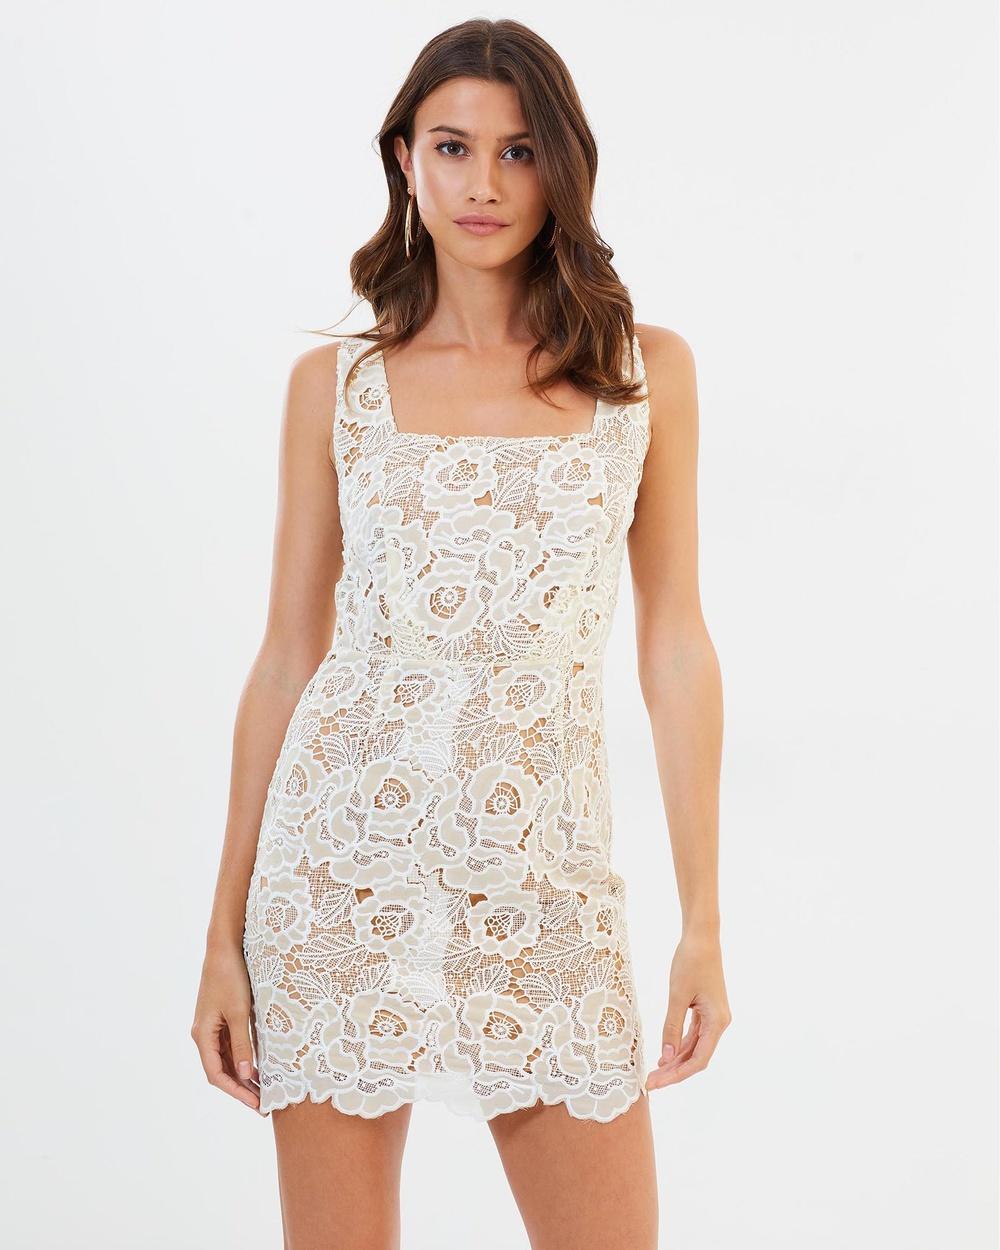 Winona Countdown Mini Dress Dresses White Countdown Mini Dress